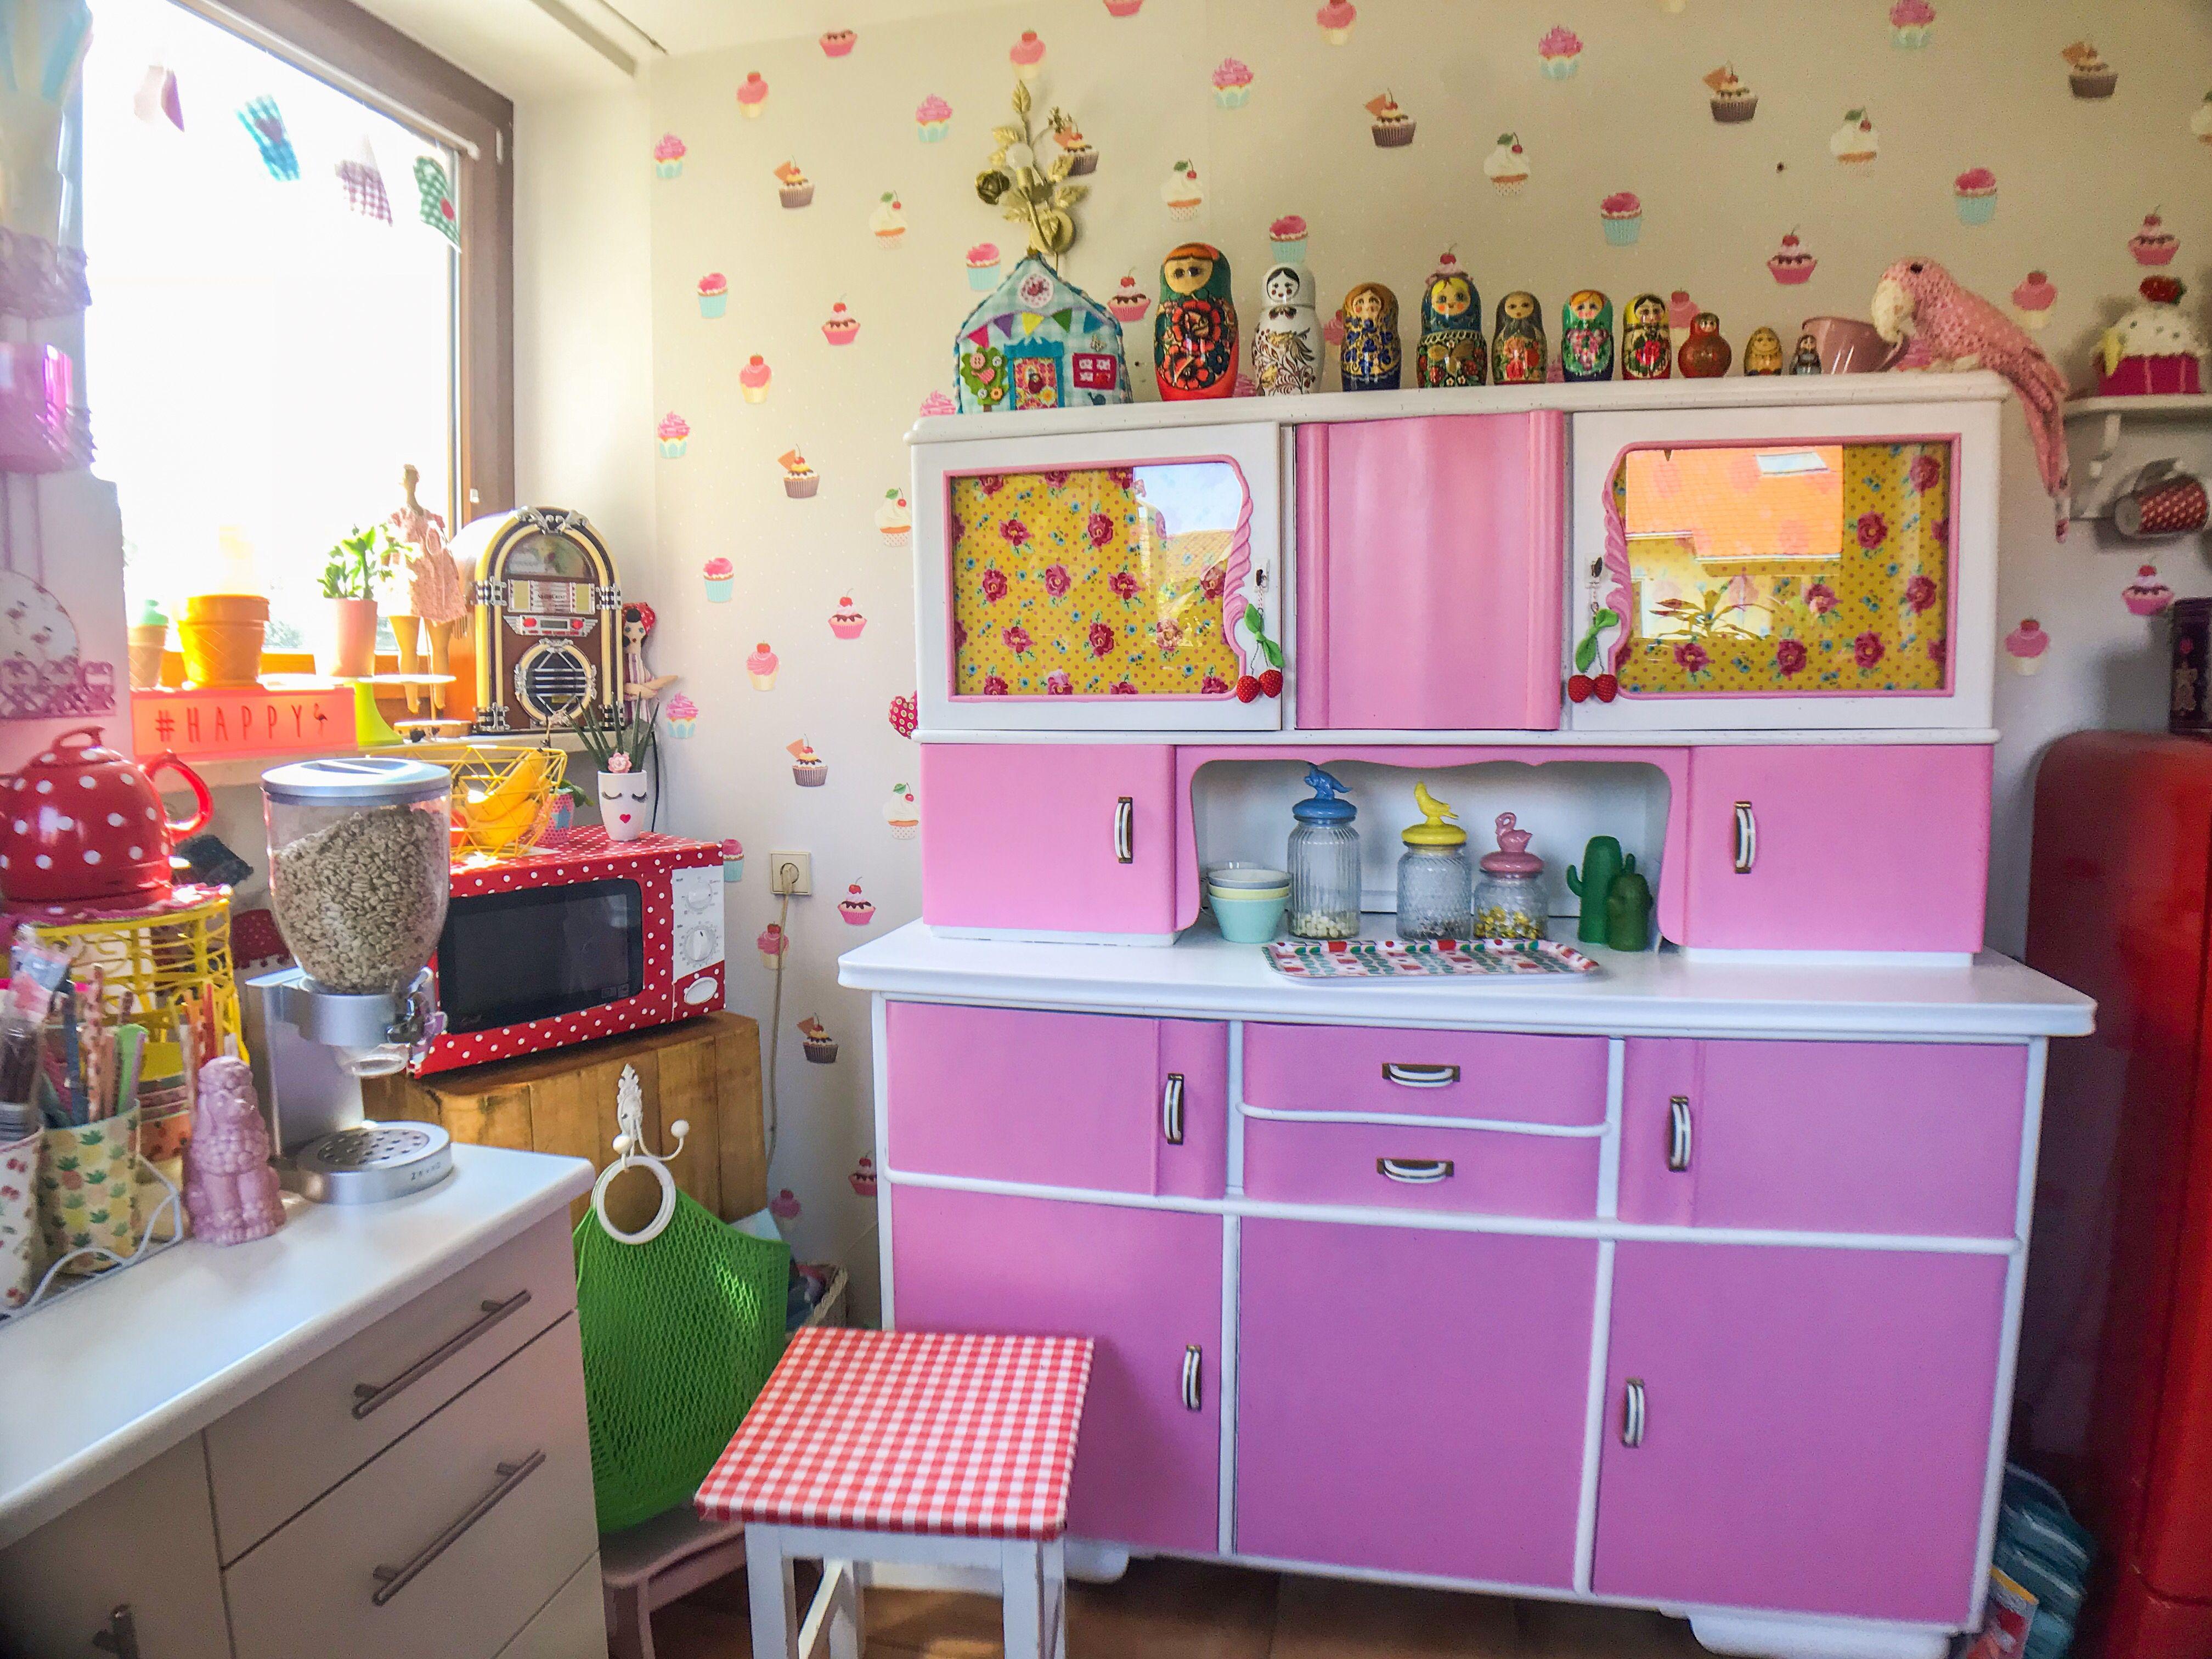 Buffet in pink Zuhause, Küche, Selbstgemacht